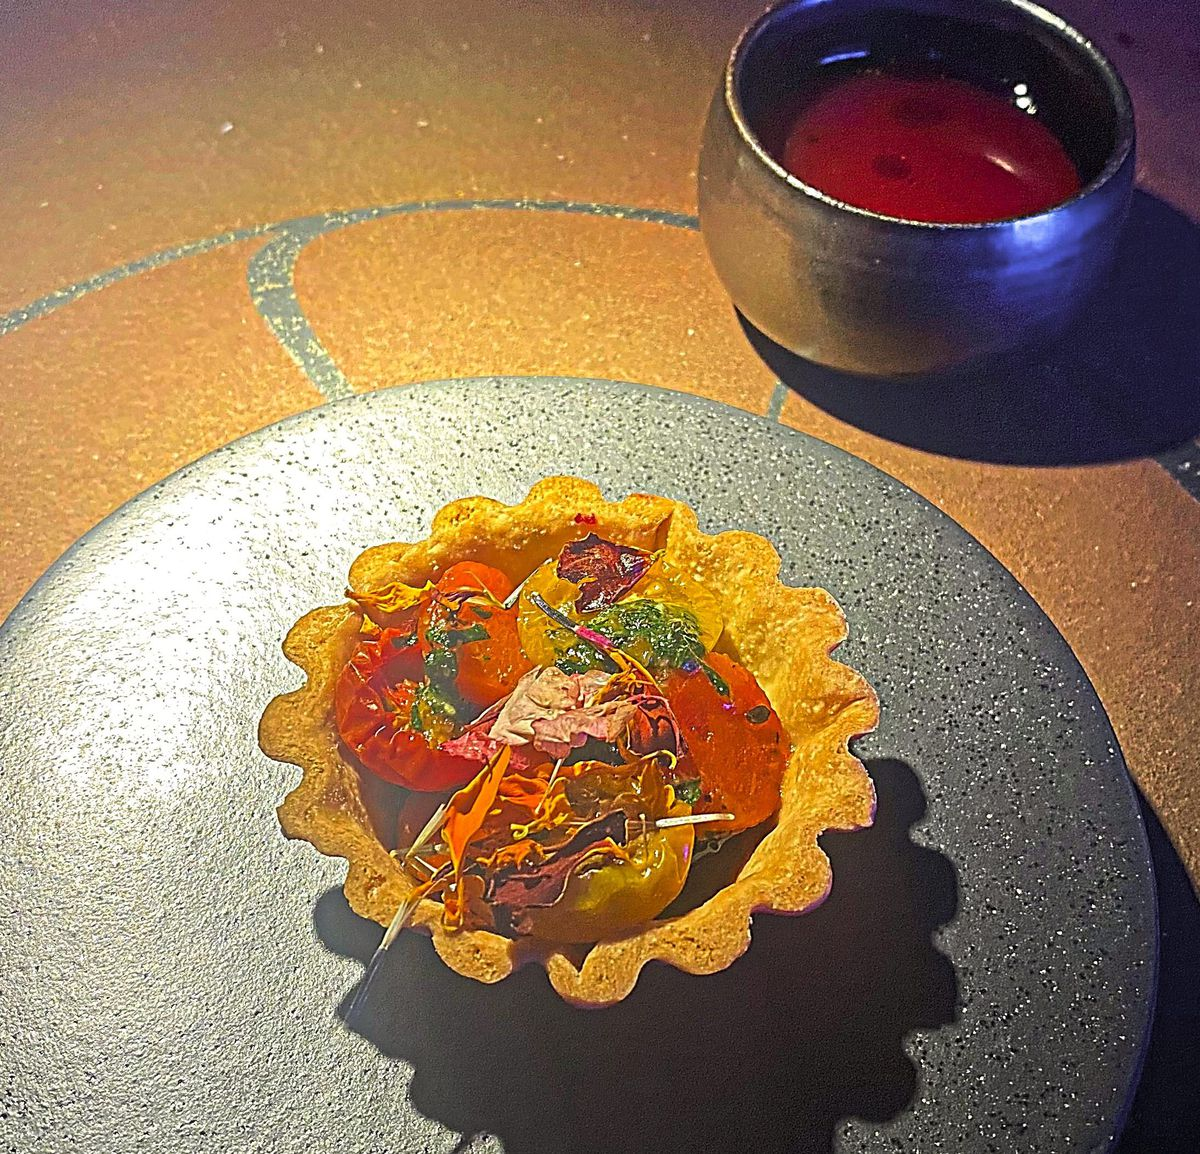 Tomato tart and v8 juice